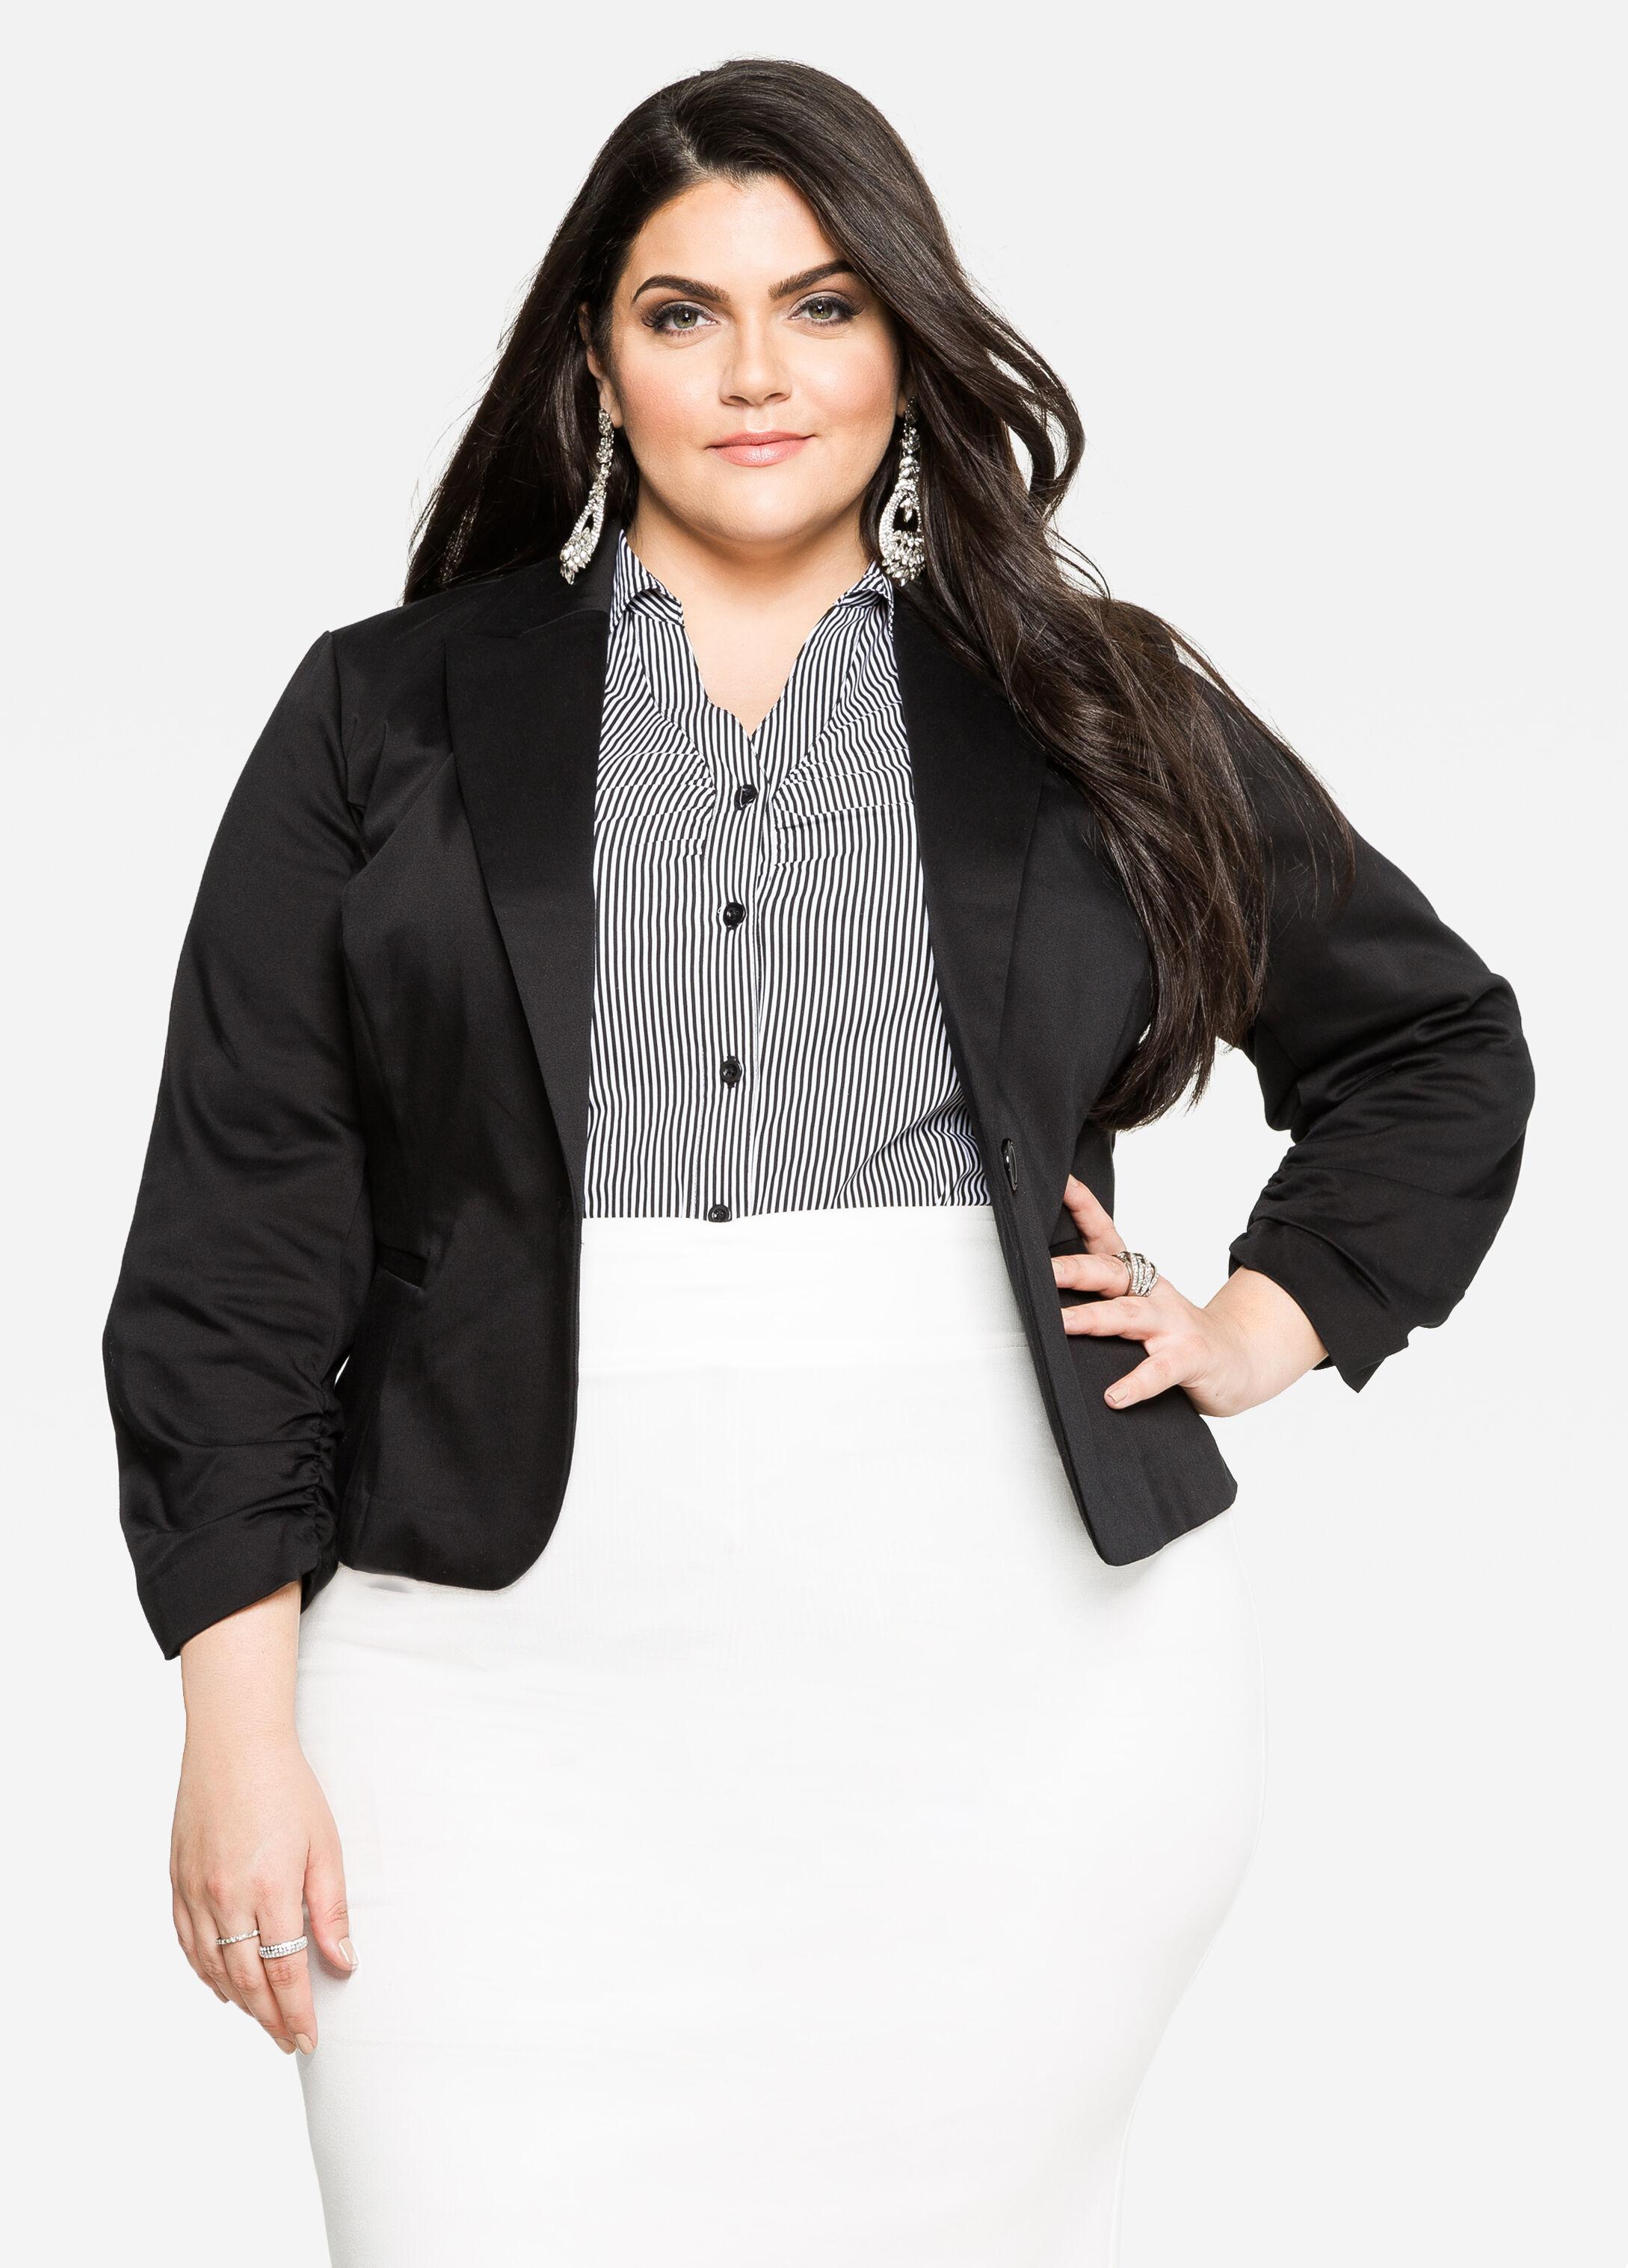 Buy Plus Size Black Blazer for Women - Ashley Stewart